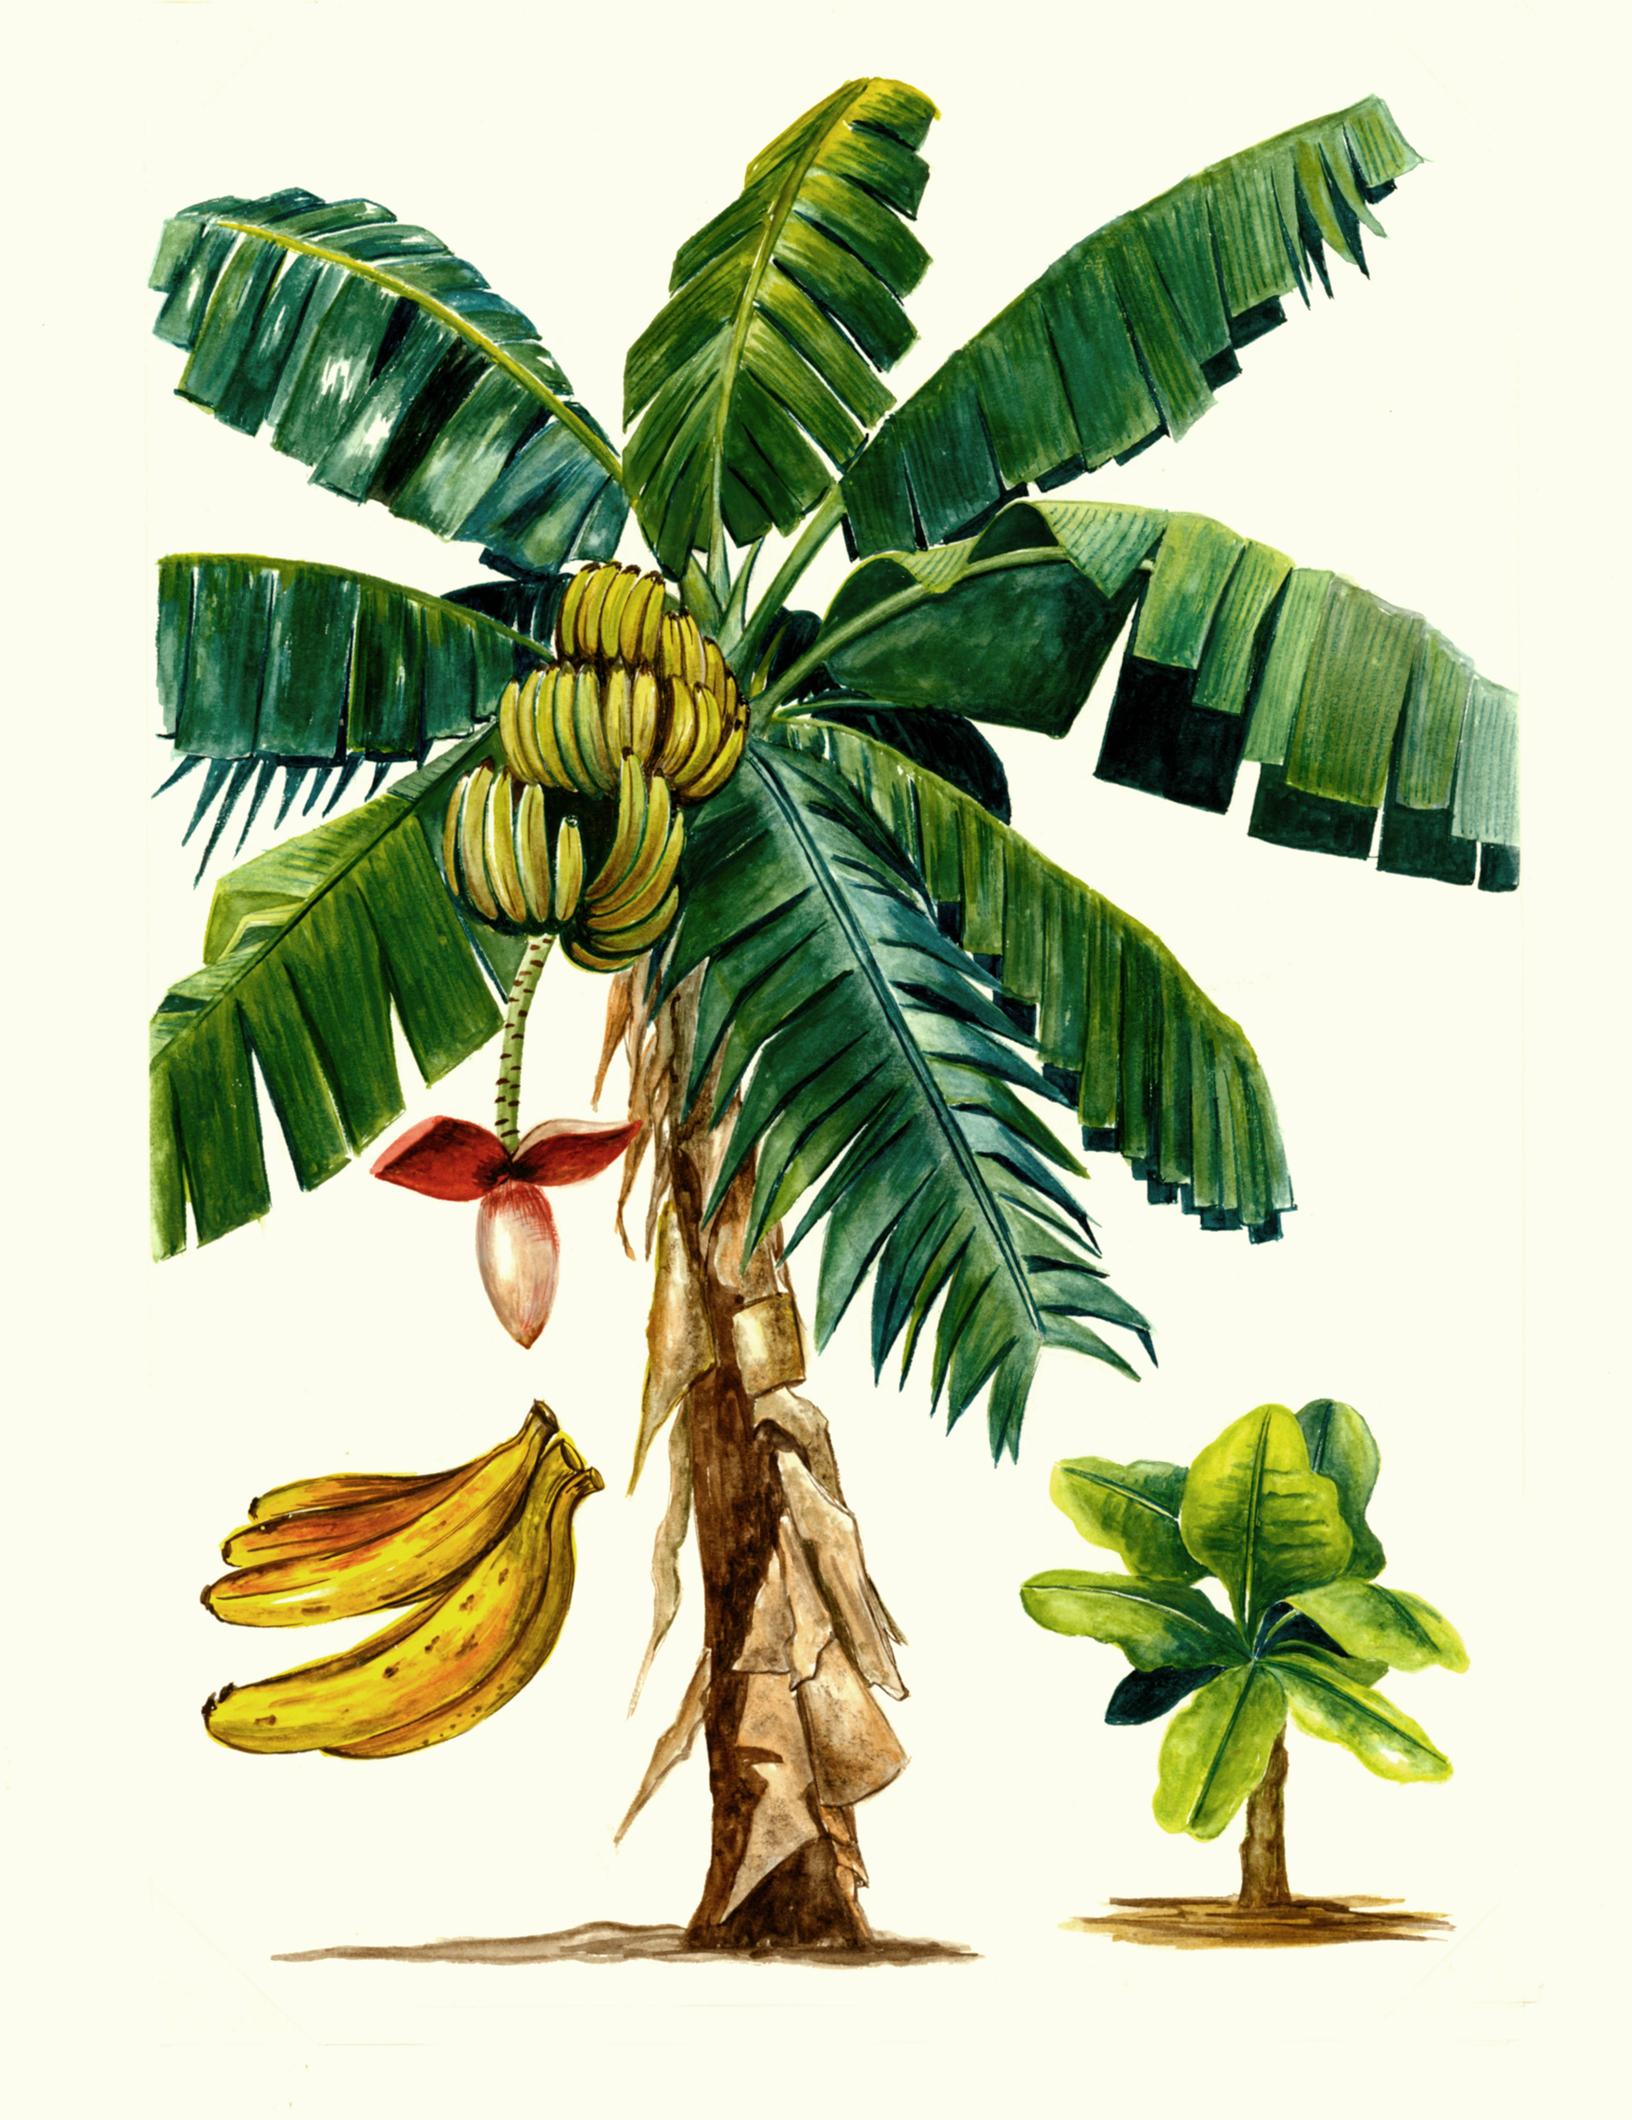 What Are Banana Plant Pups How To Separate Banana Tree: Health Benefits Of Banana